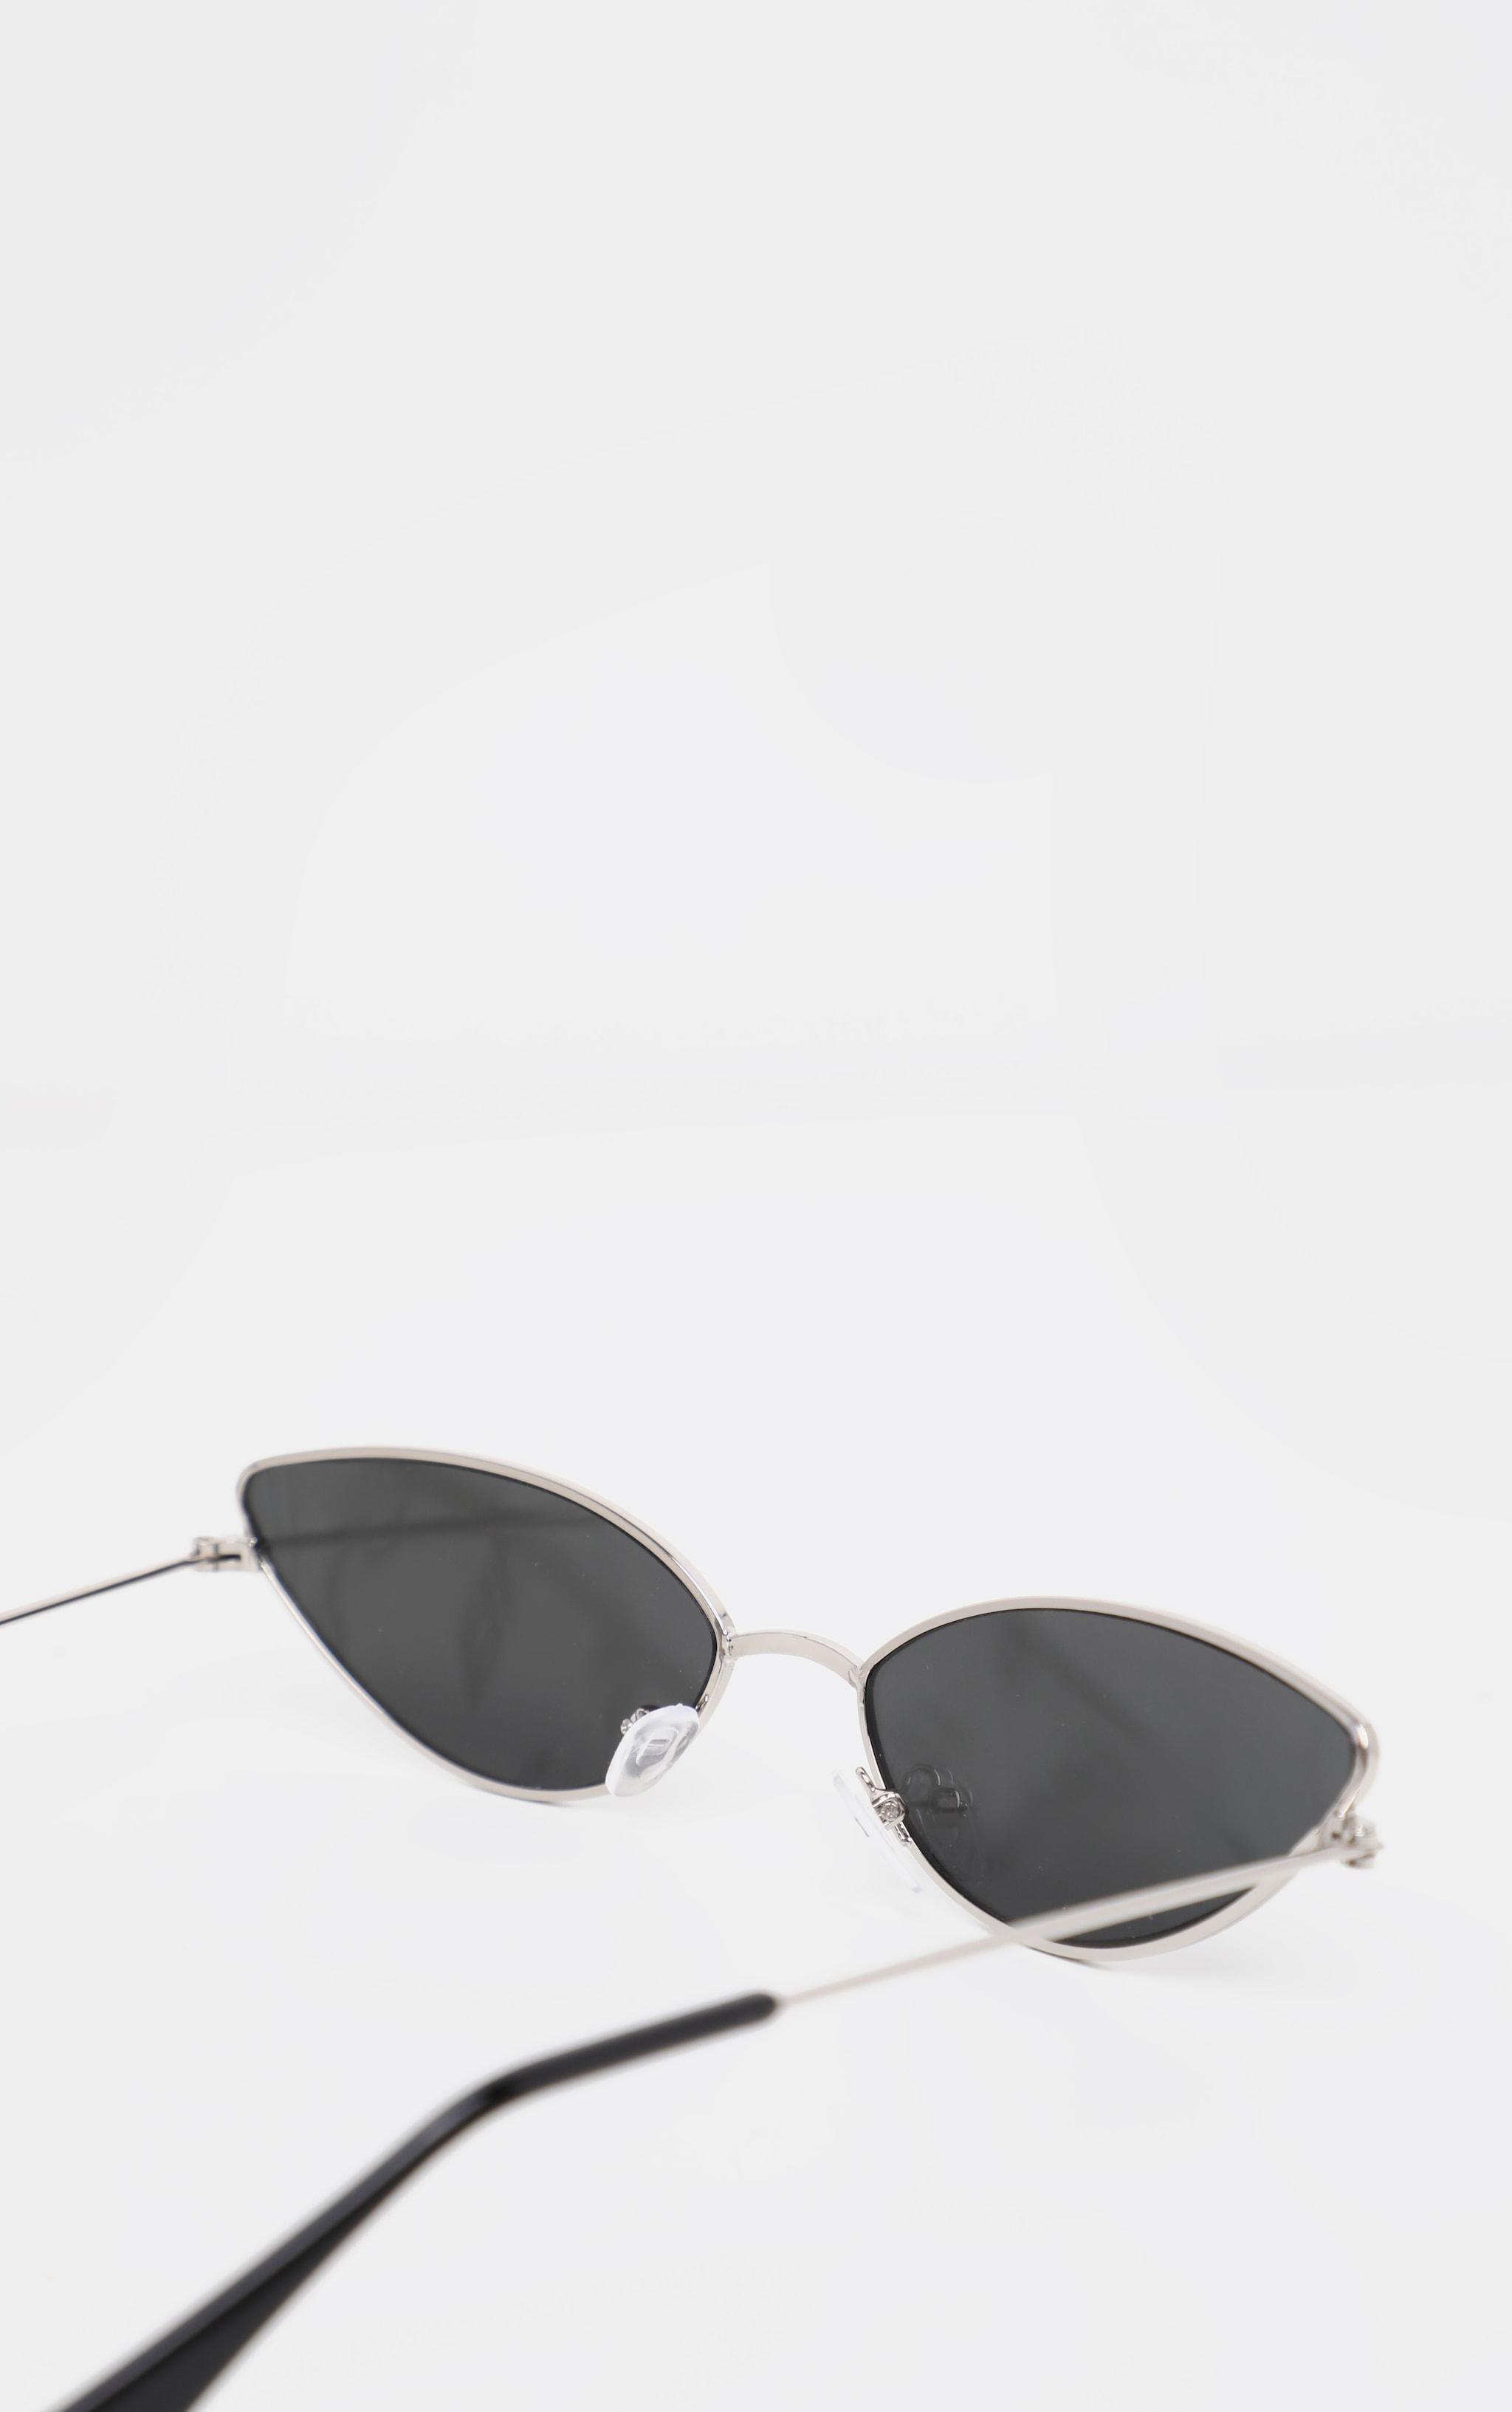 Silver Revo Metal Almond Shape Sunglasses 4